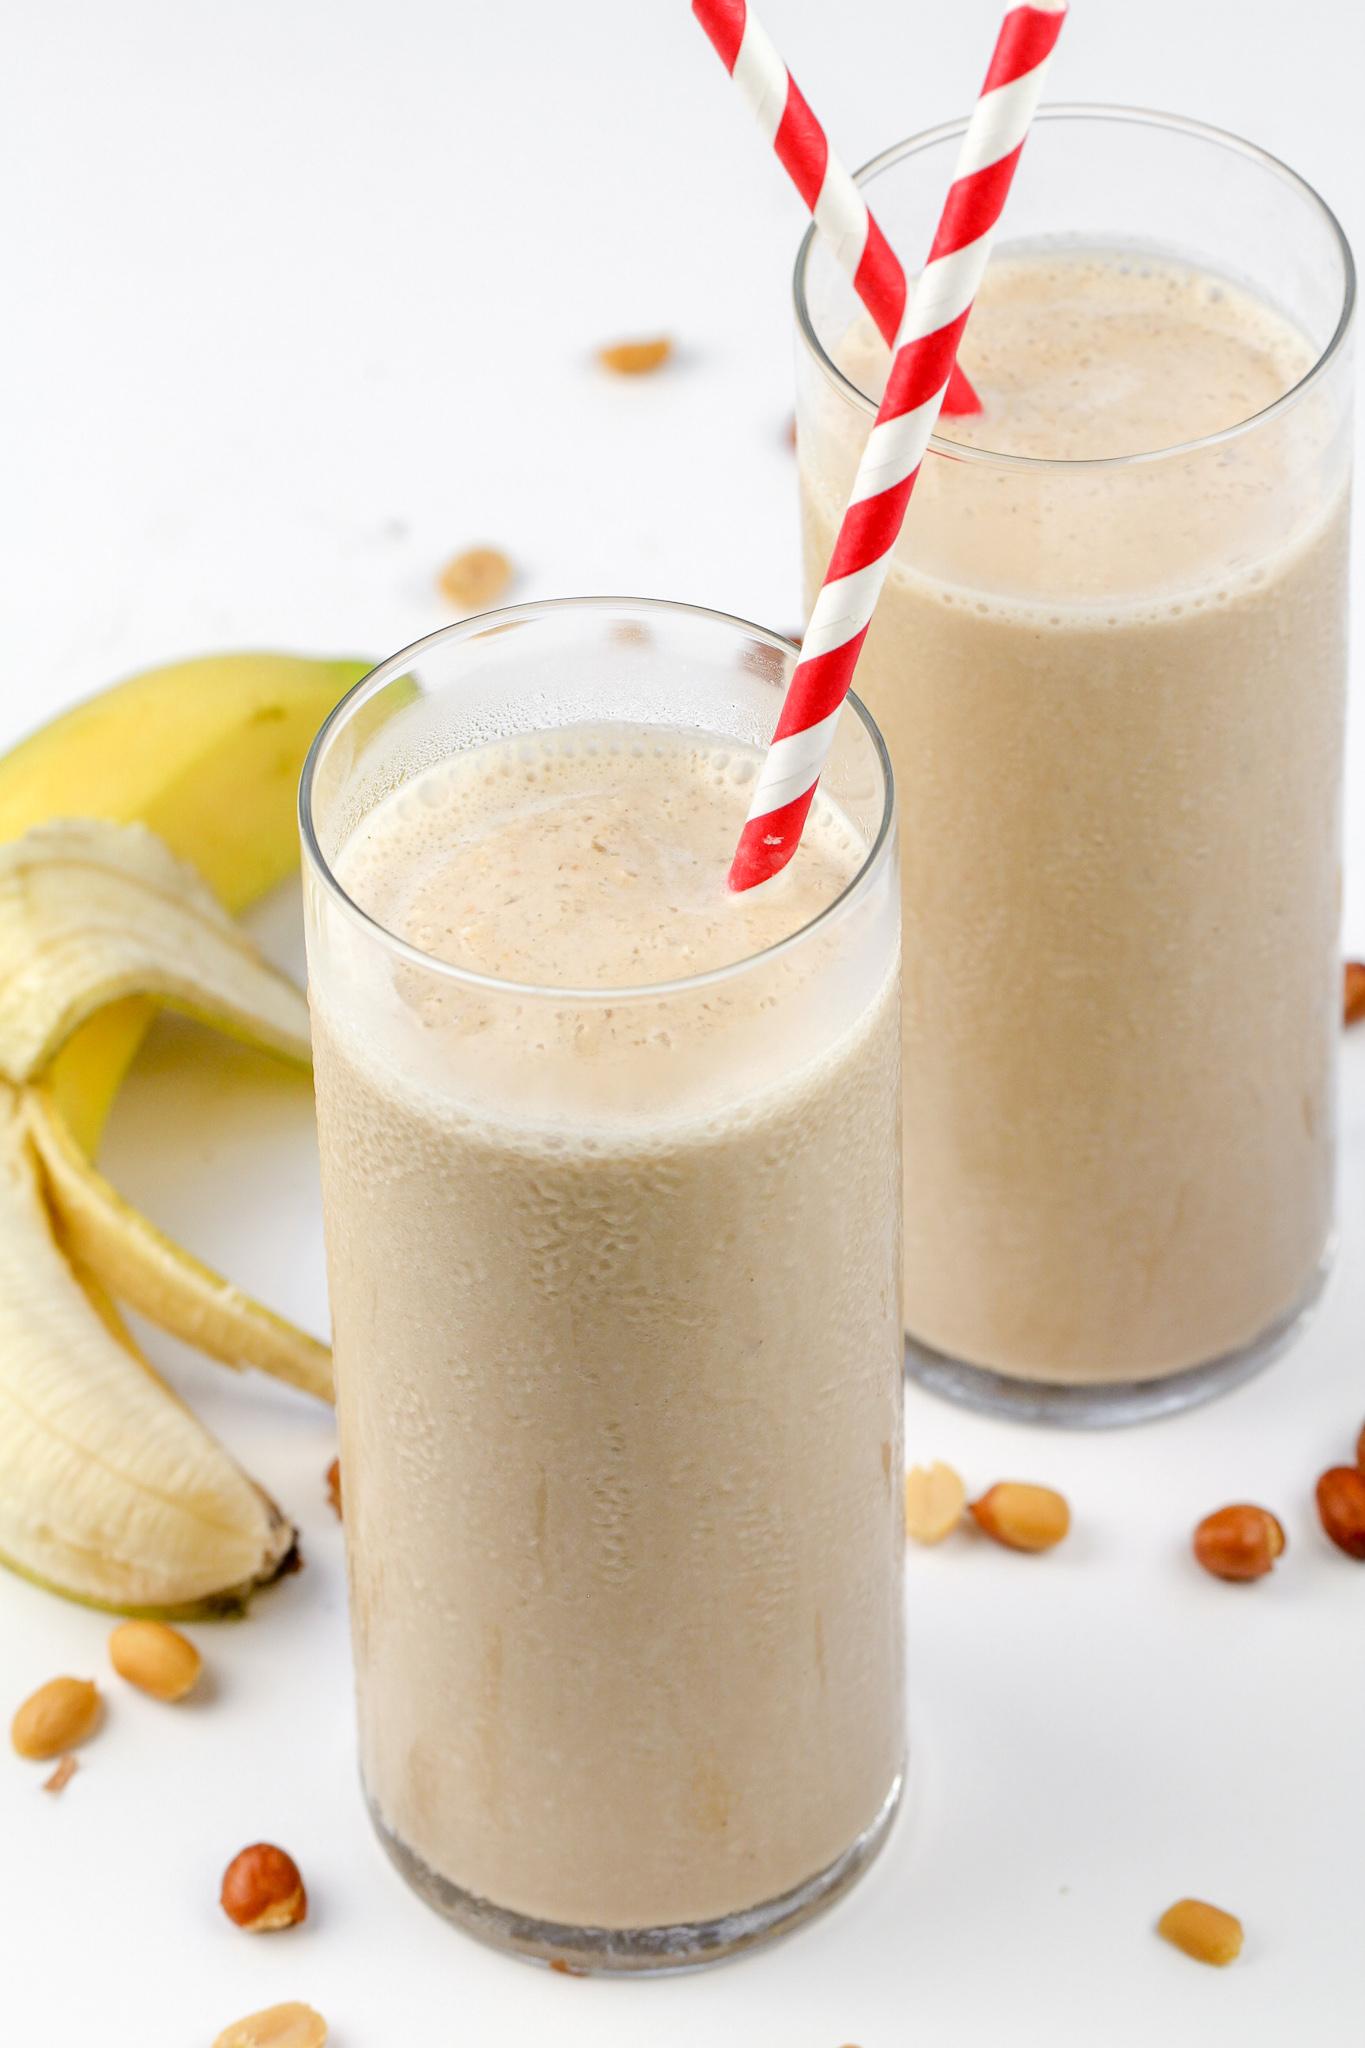 Peanut Paradise Tropical Smoothie Copycat Recipe